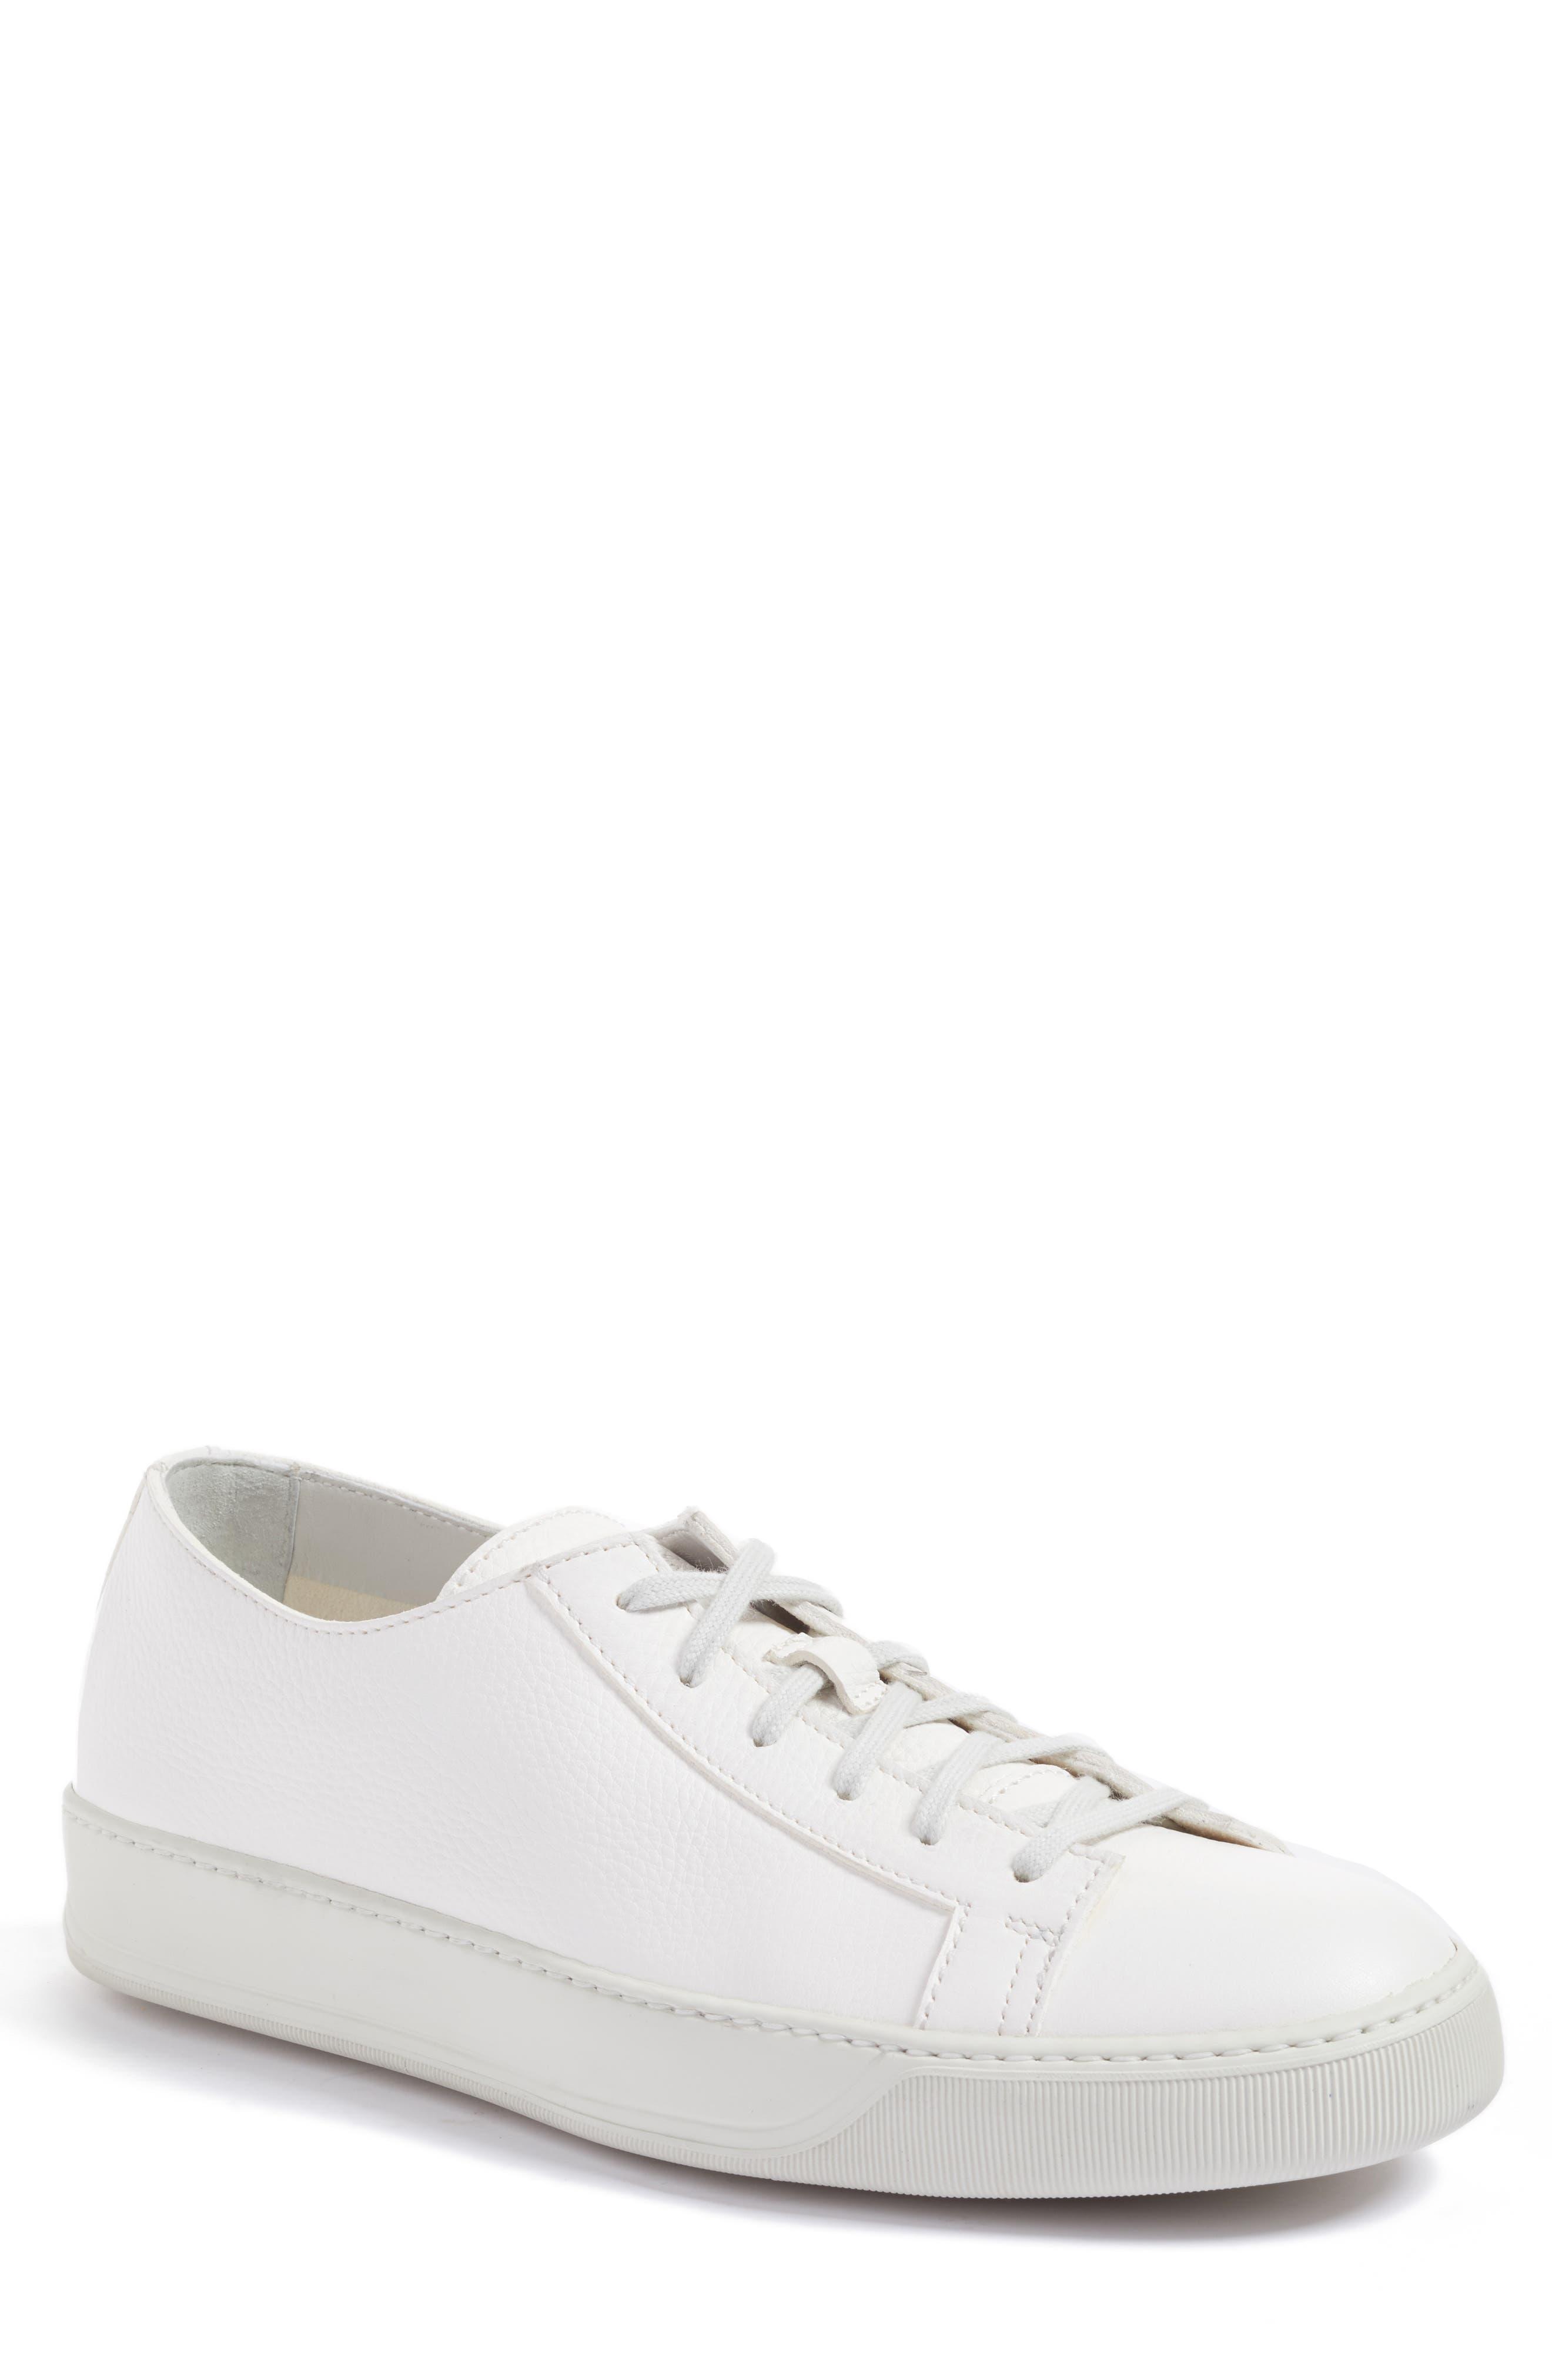 Santoni Cleanic Sneaker (Men)